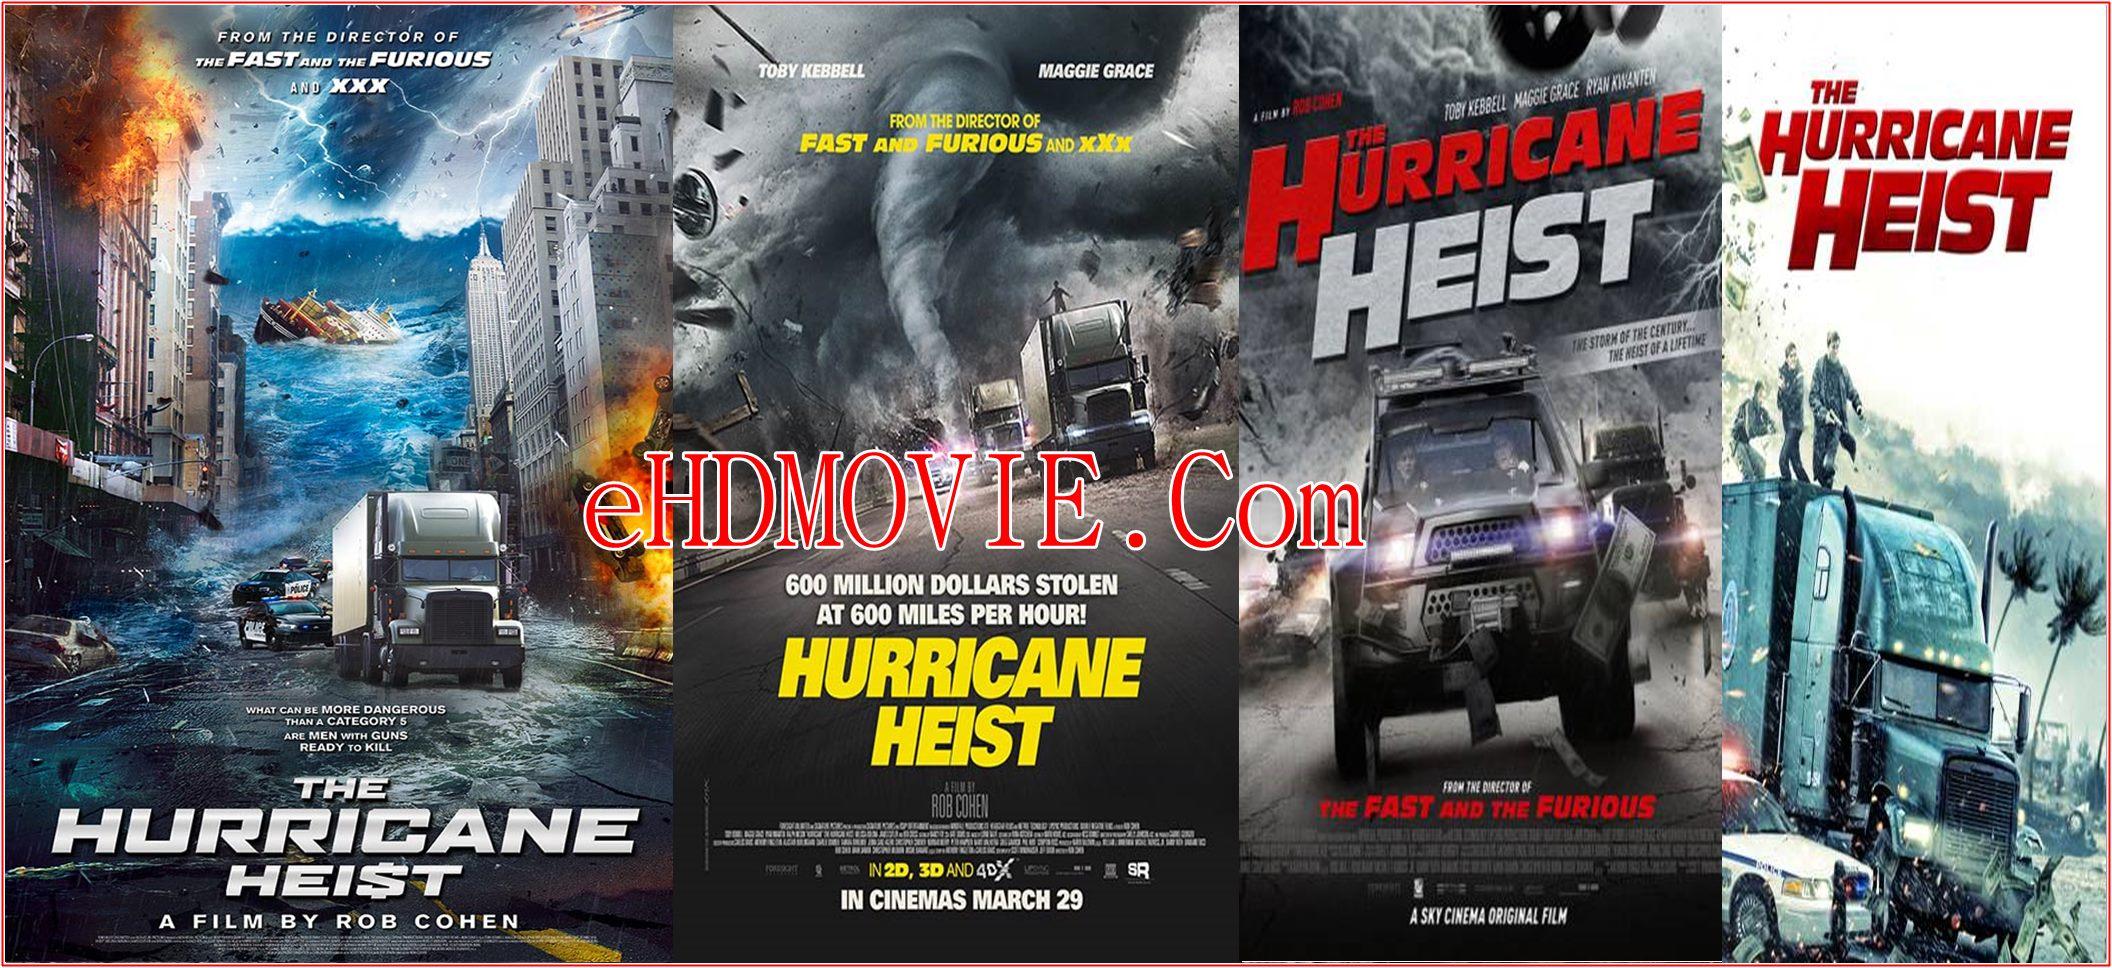 The Hurricane Heist 2018 Full Movie Dual Audio [Hindi – English] 1080p – 720p – HEVC – 480p ORG Blu-Ray 350MB – 550MB – 1.1GB – 3GB ESubs Free Download